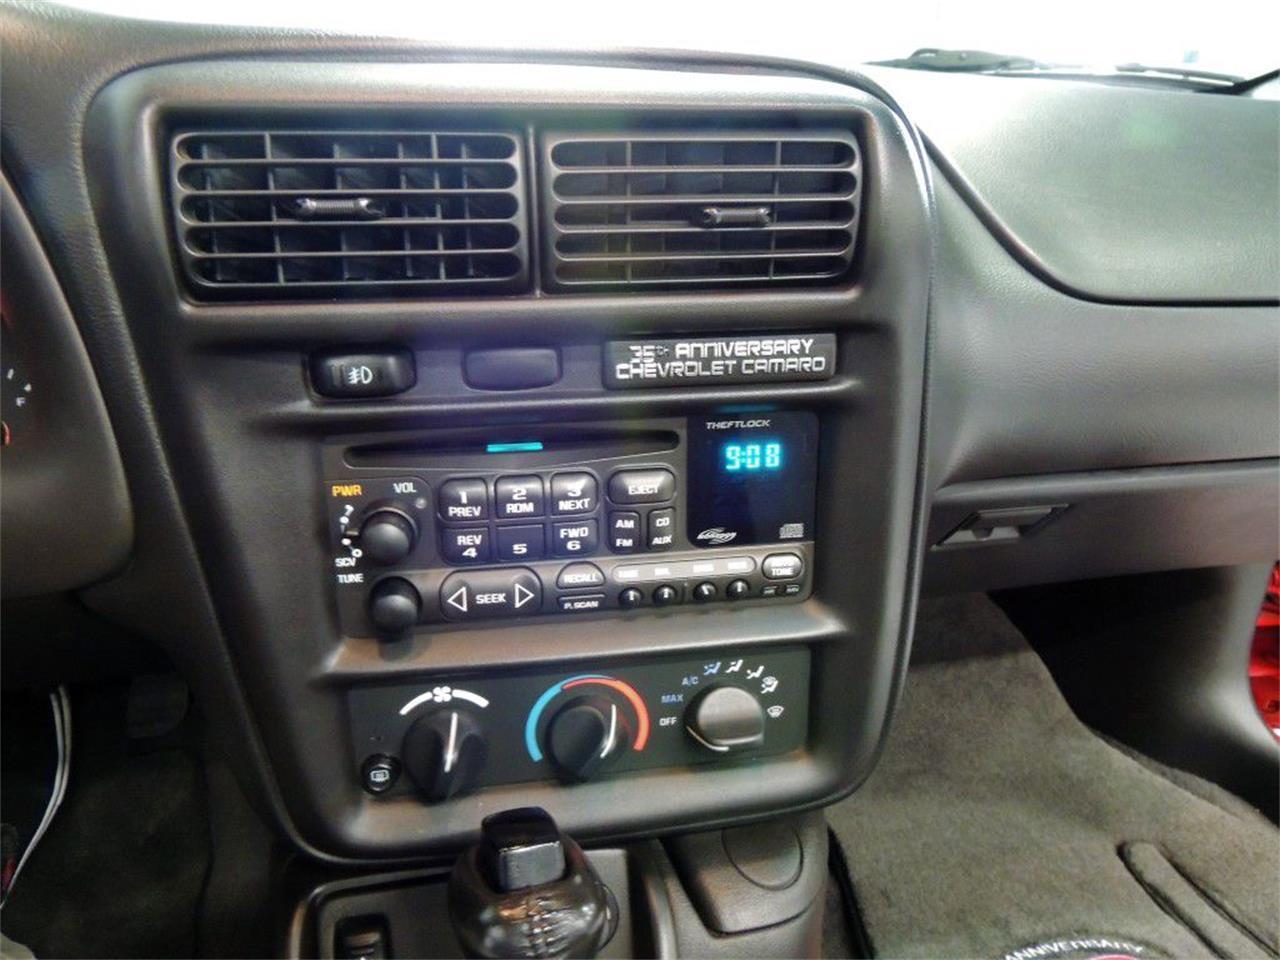 2002 Chevrolet Camaro (CC-1318567) for sale in Boca Raton, Florida